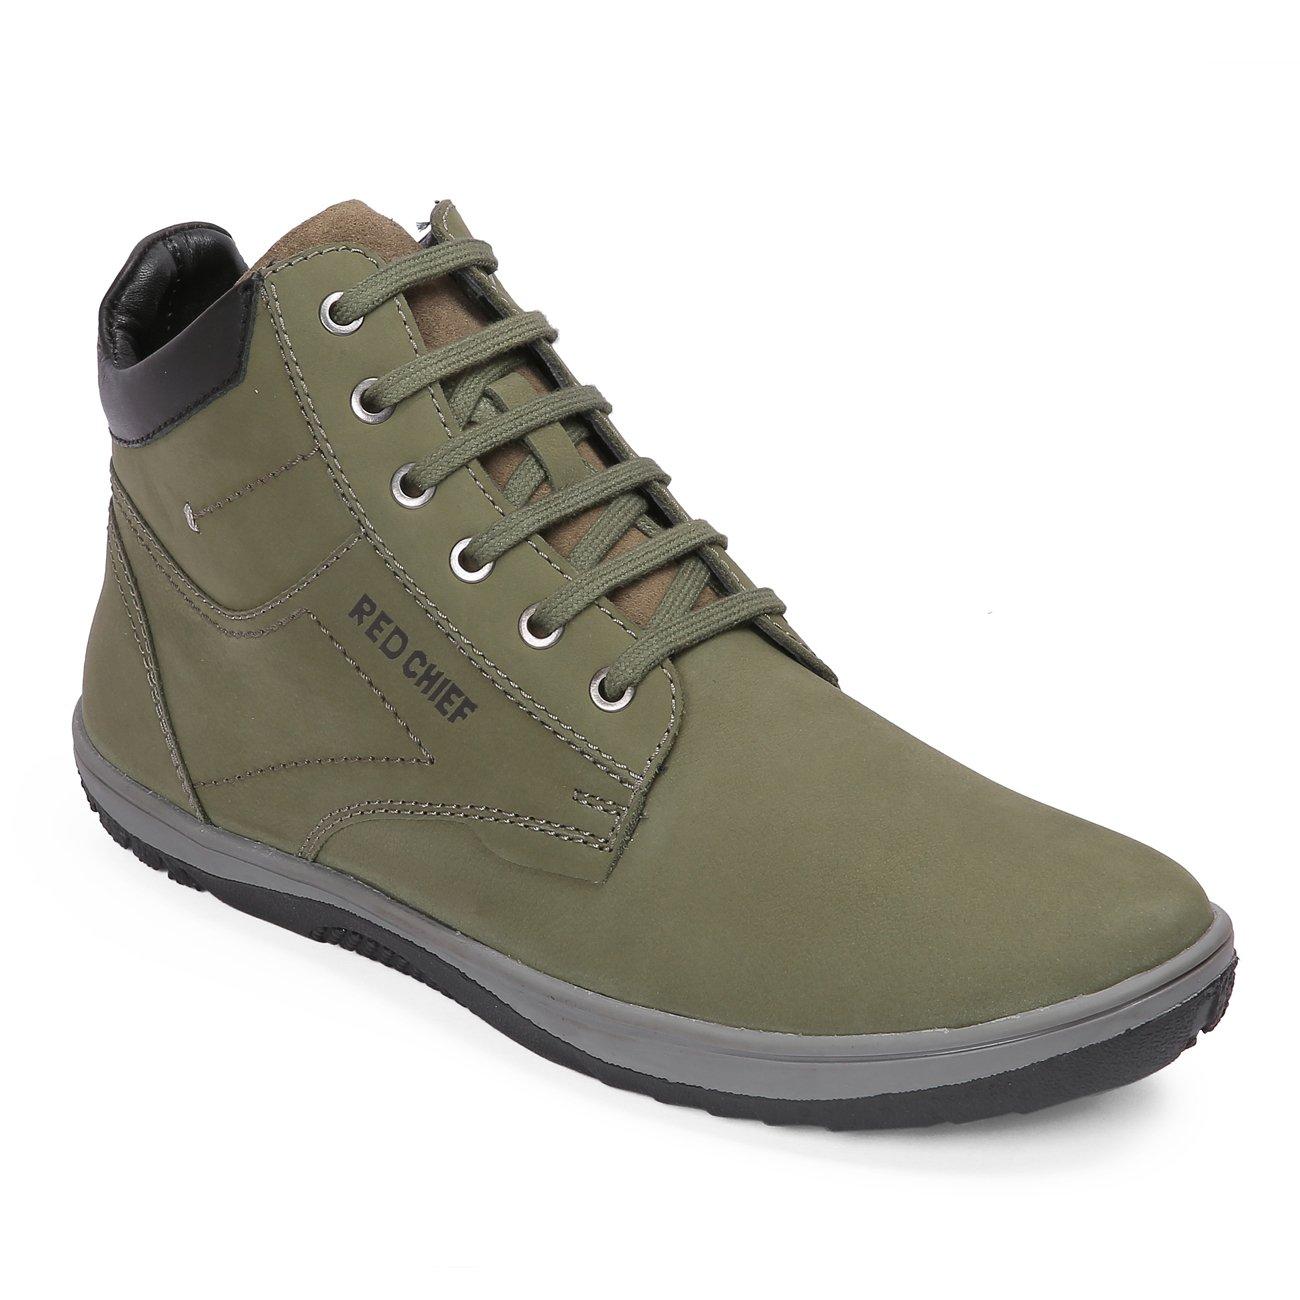 Buy Red Chief Men's Green Boots-6 UK